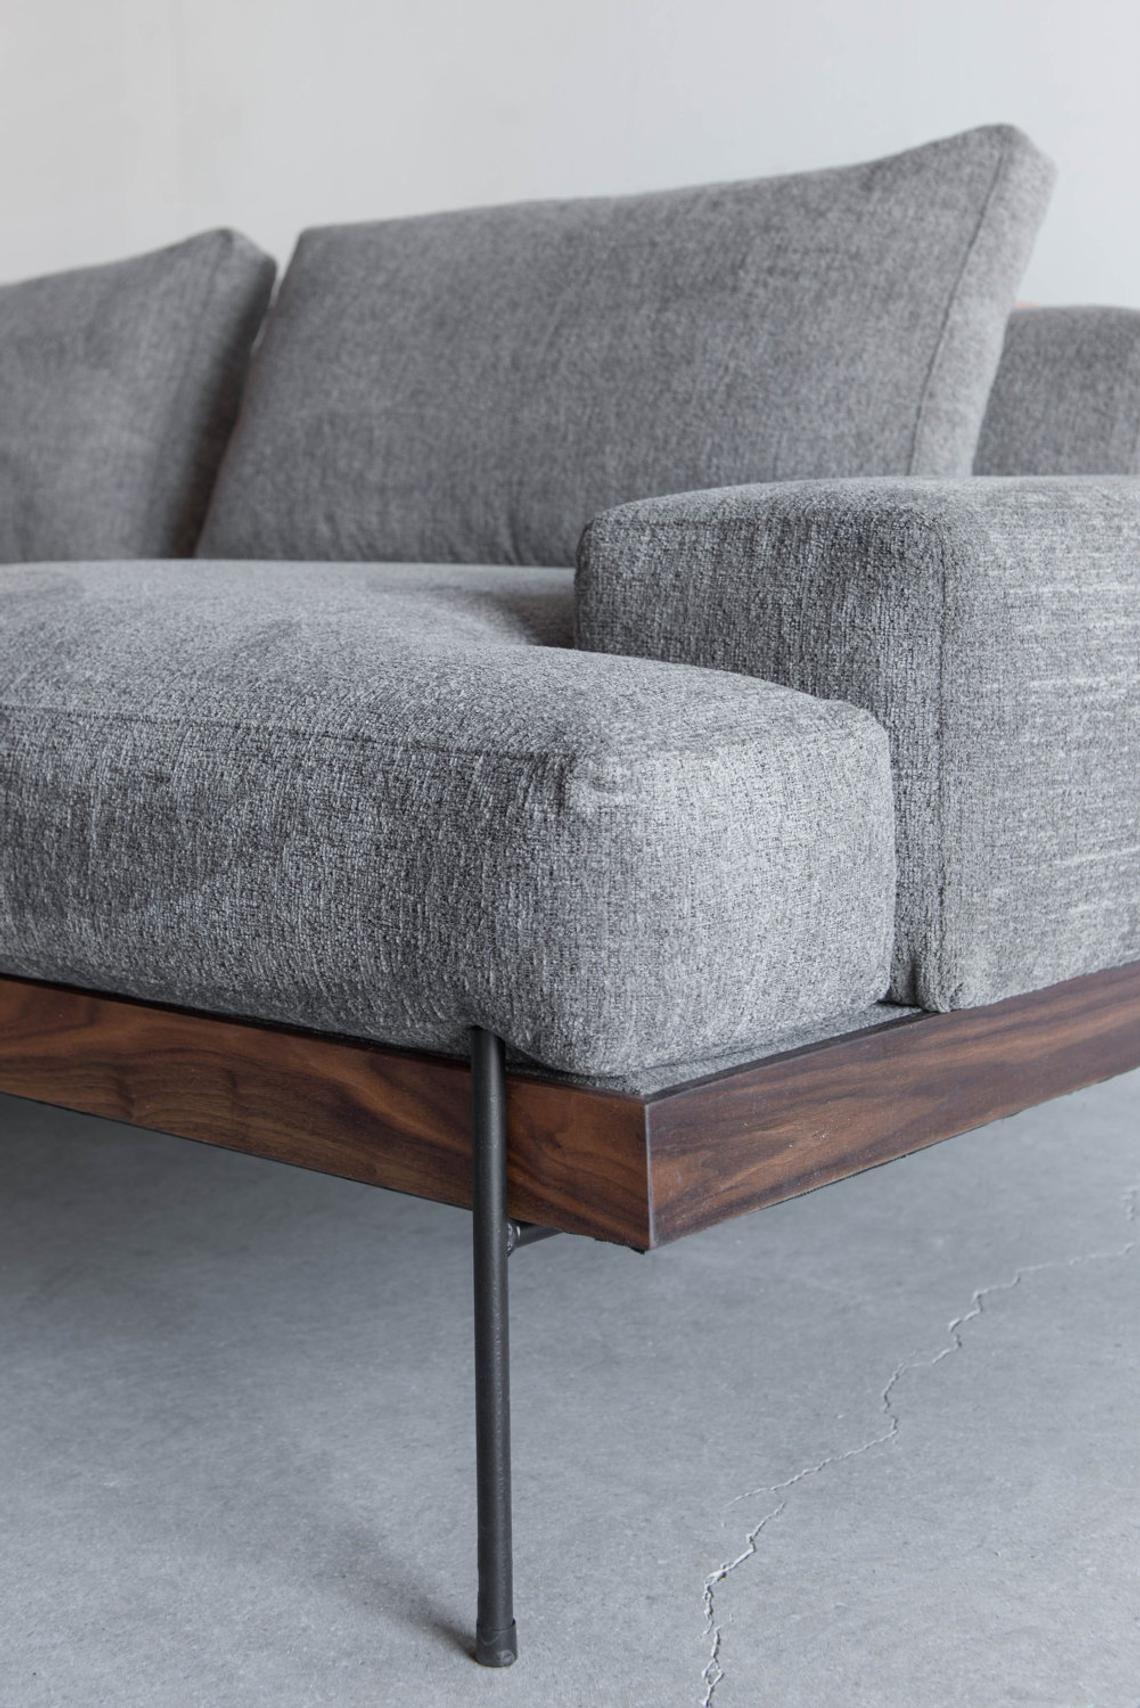 Rivera Sofa Walnut And Steel Base Down Cushions Luxury Sofa Design Luxury Sofa Furniture